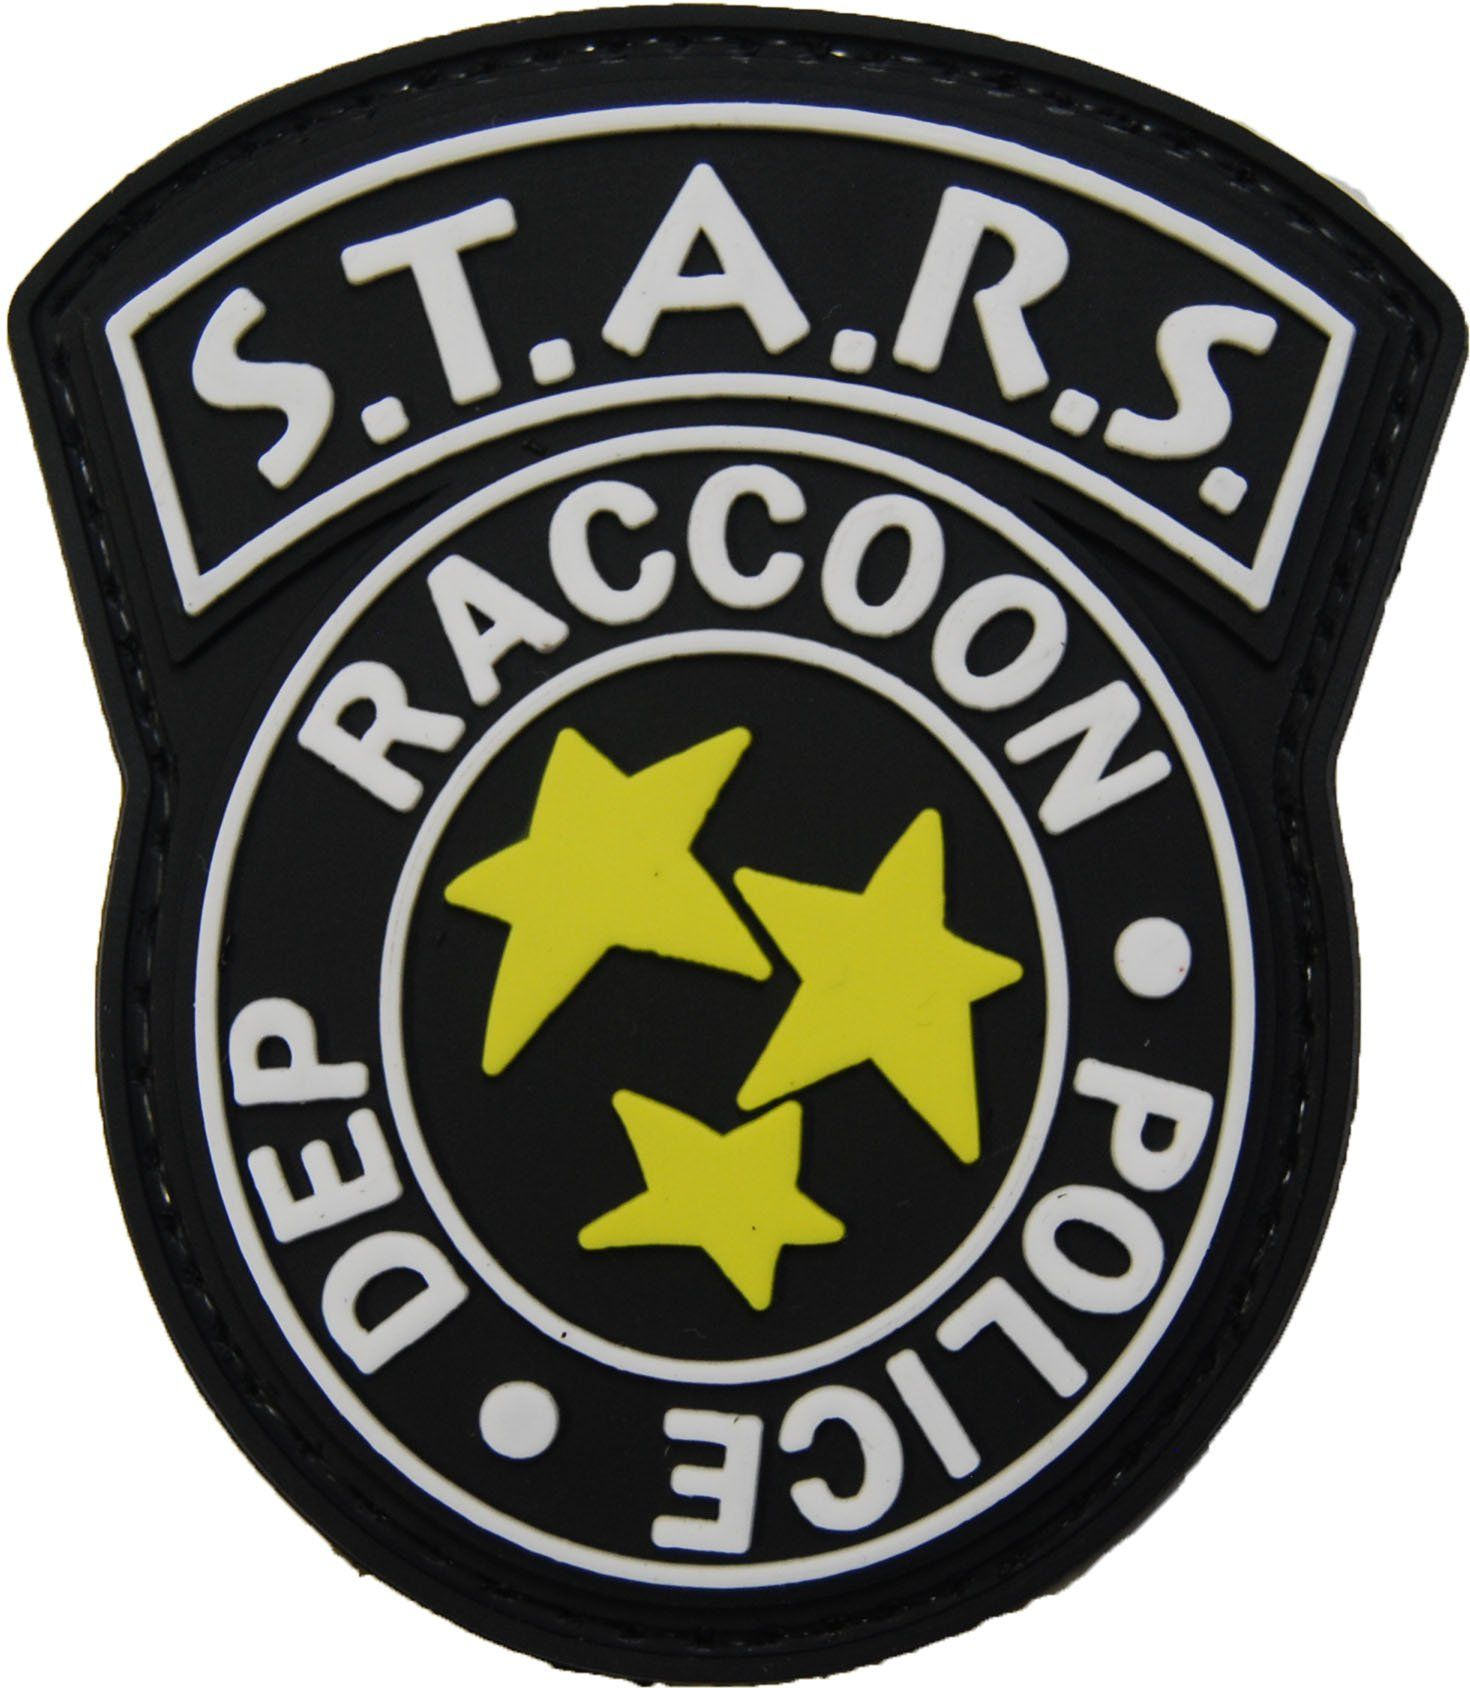 S T A R S Raccoon Police Dep Resident Evil Raccoon City Resident Evil Resident Evil Movie